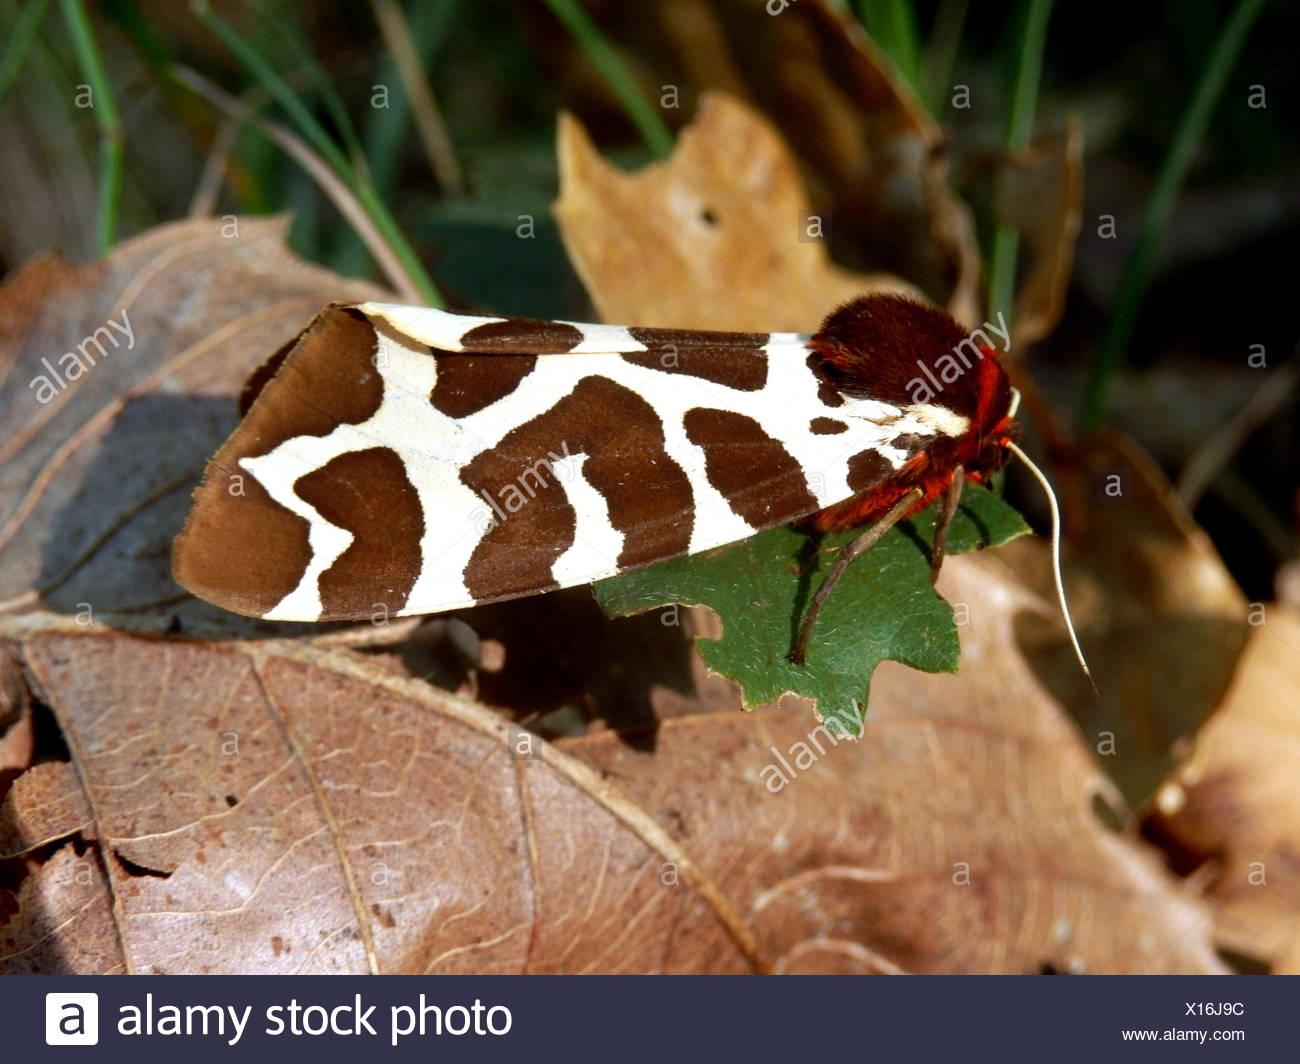 Garden Tiger Moth Stock Photo: 276126632 - Alamy